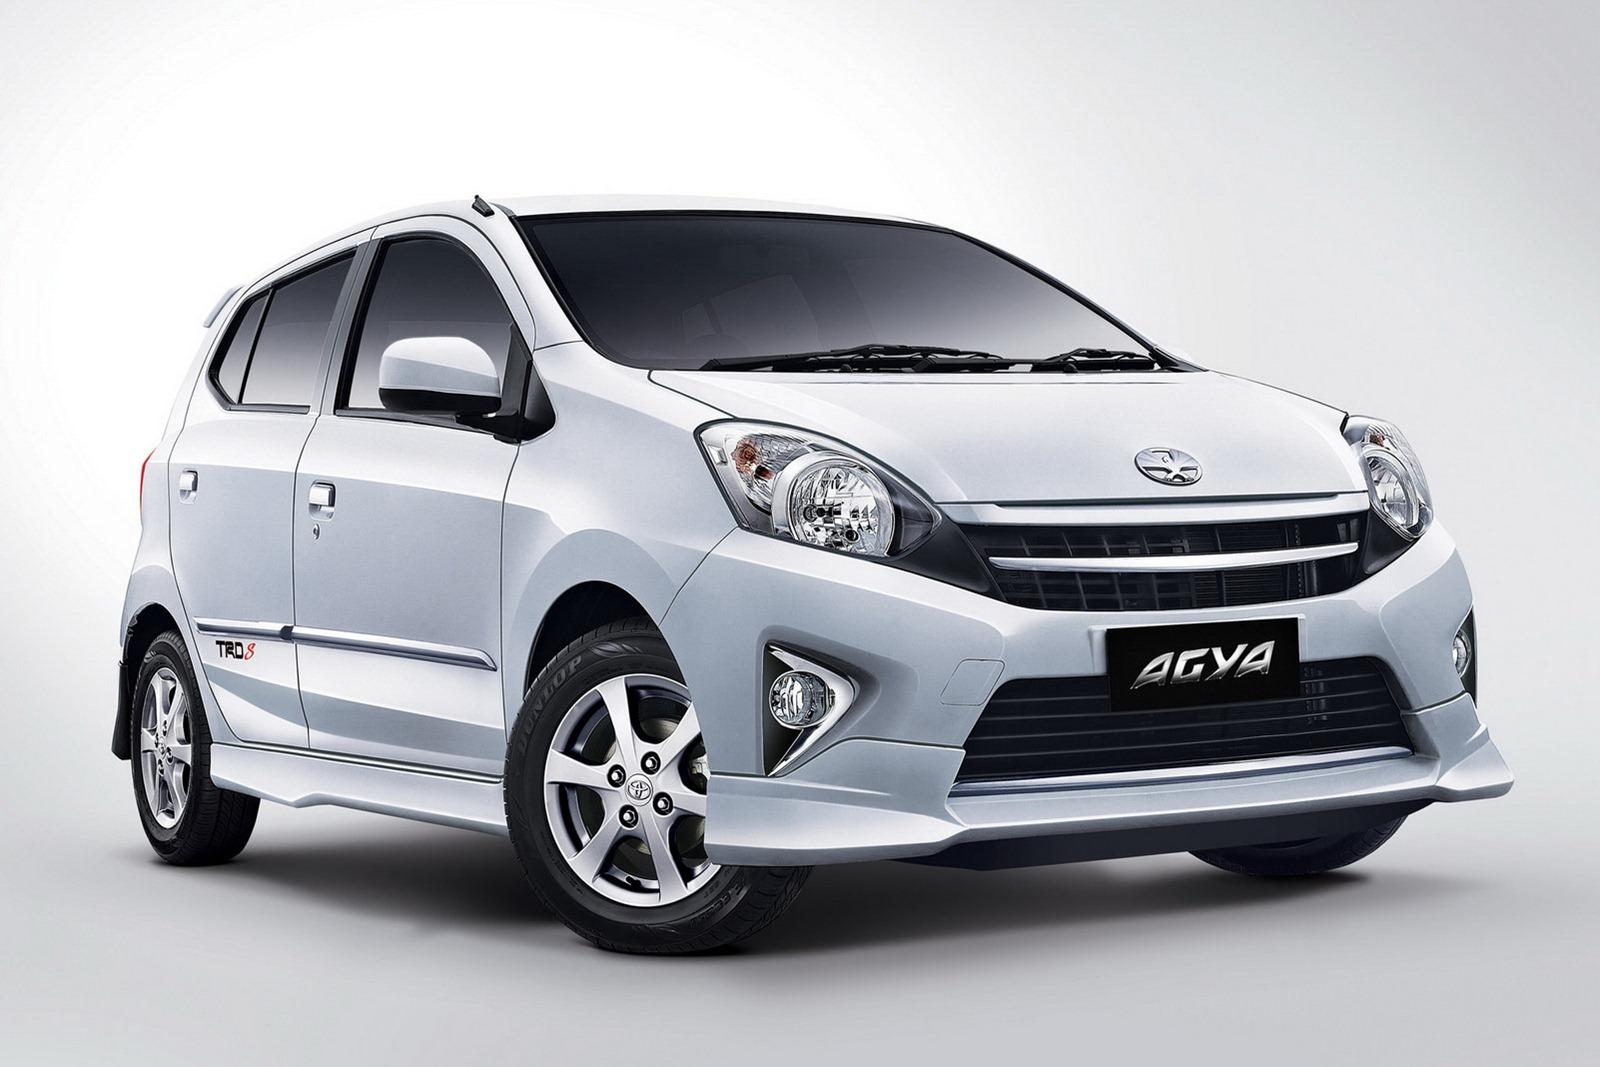 Kelebihan Kekurangan Mobil Toyota Terbaru Harga Dibawah 100 Juta Tangguh